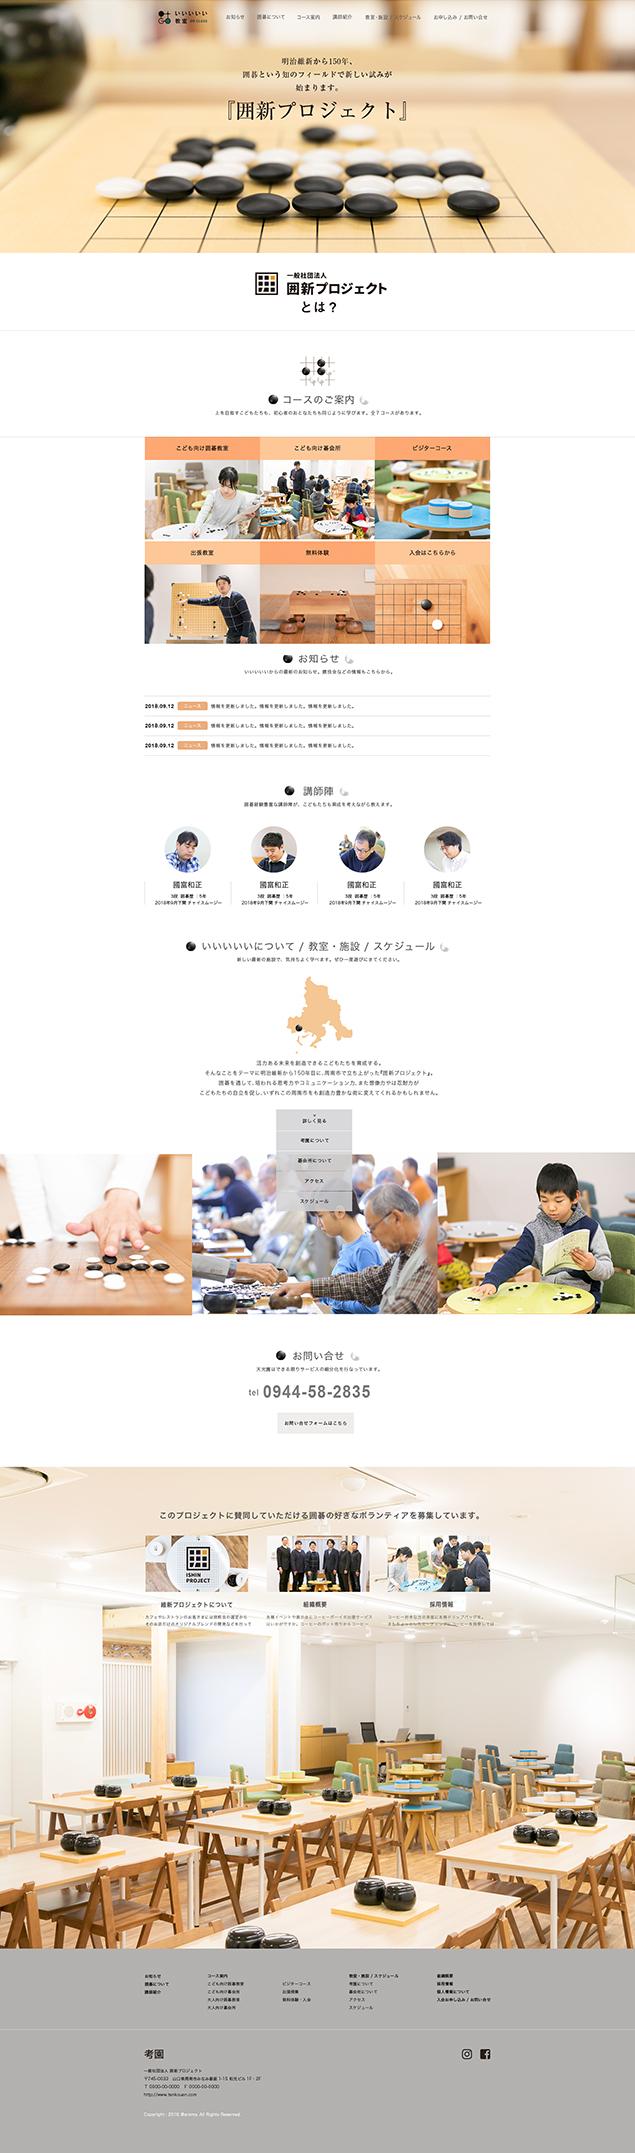 WEBサイト_デザインmap.rebirth project